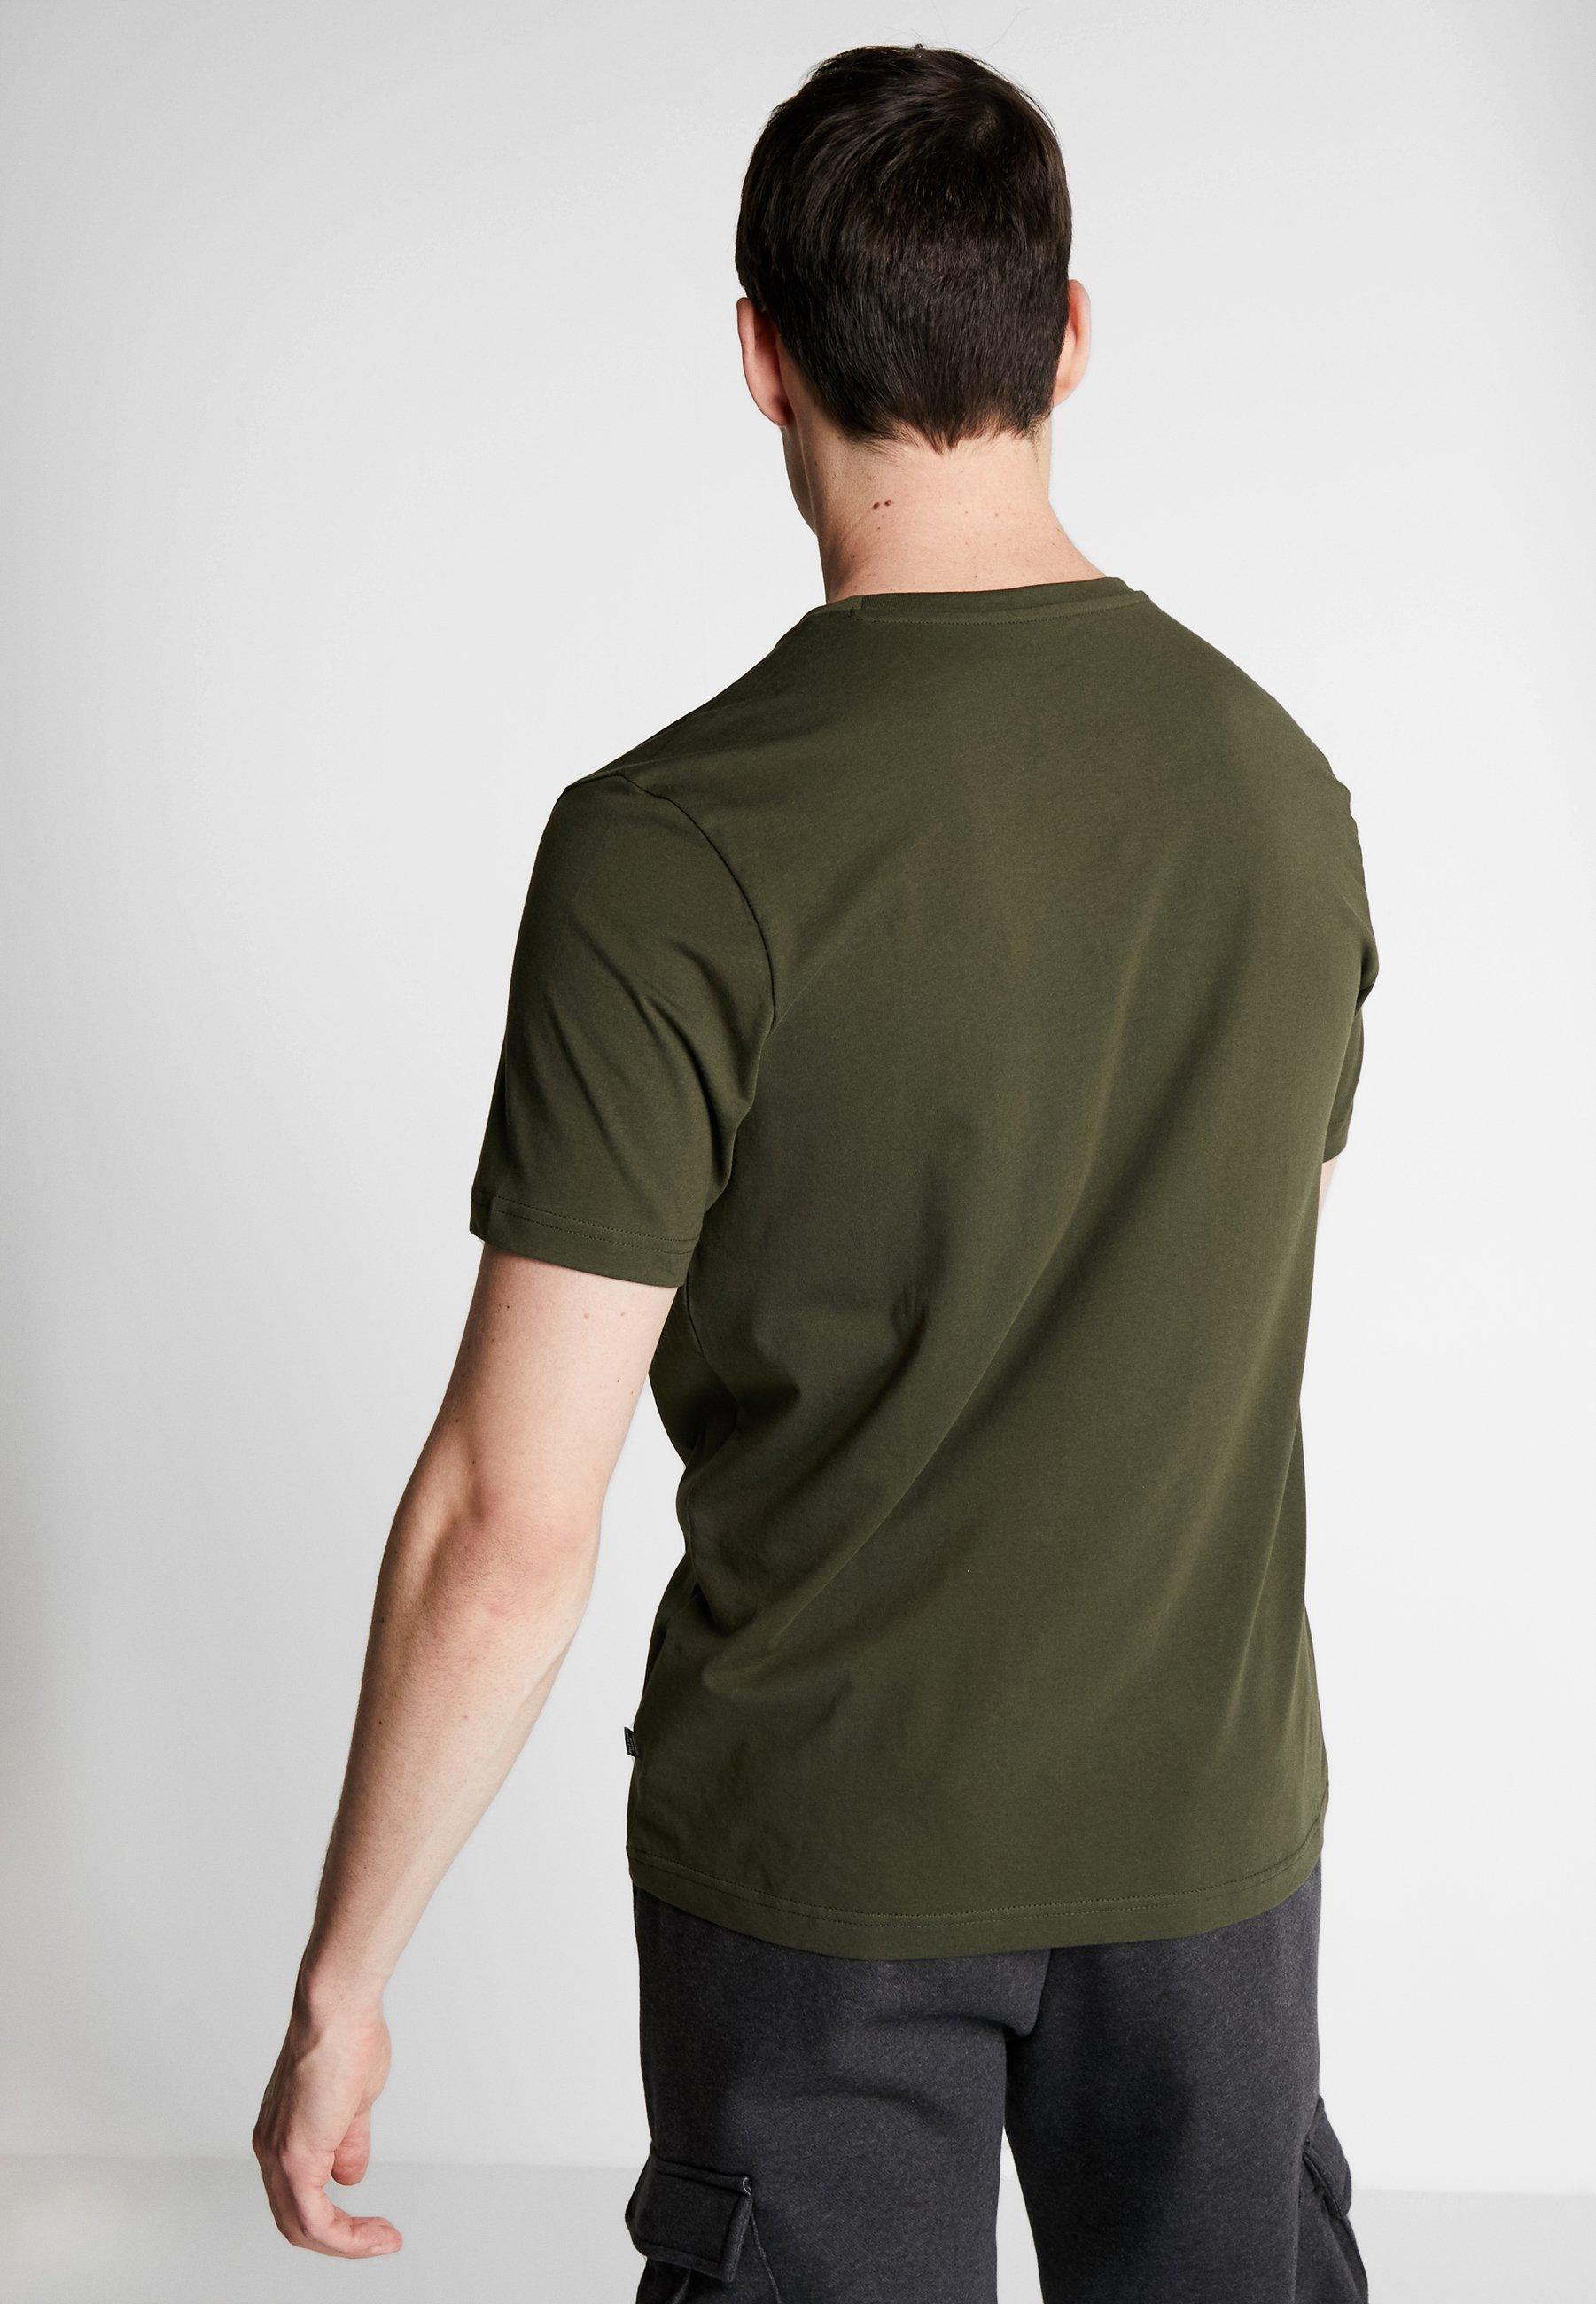 shirt Forest Rebel Night Puma Camofilled Imprimé TeeT VGUpLSzMq